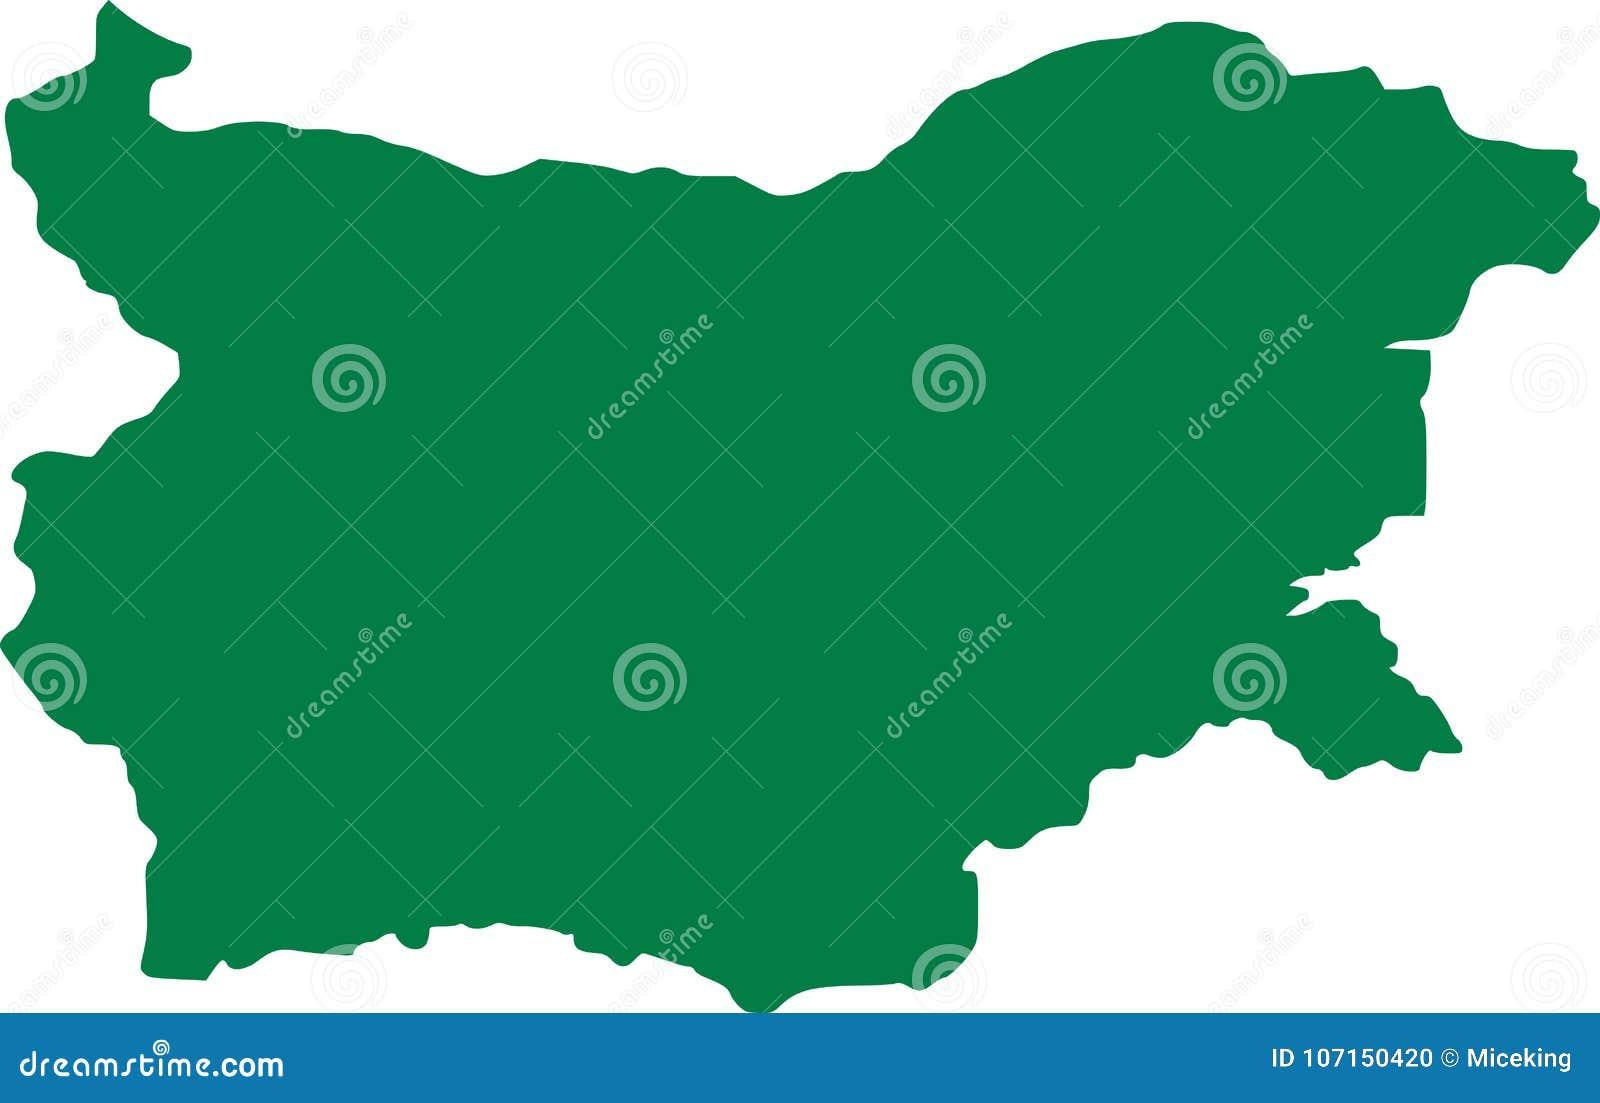 Bułgaria mapy wektor